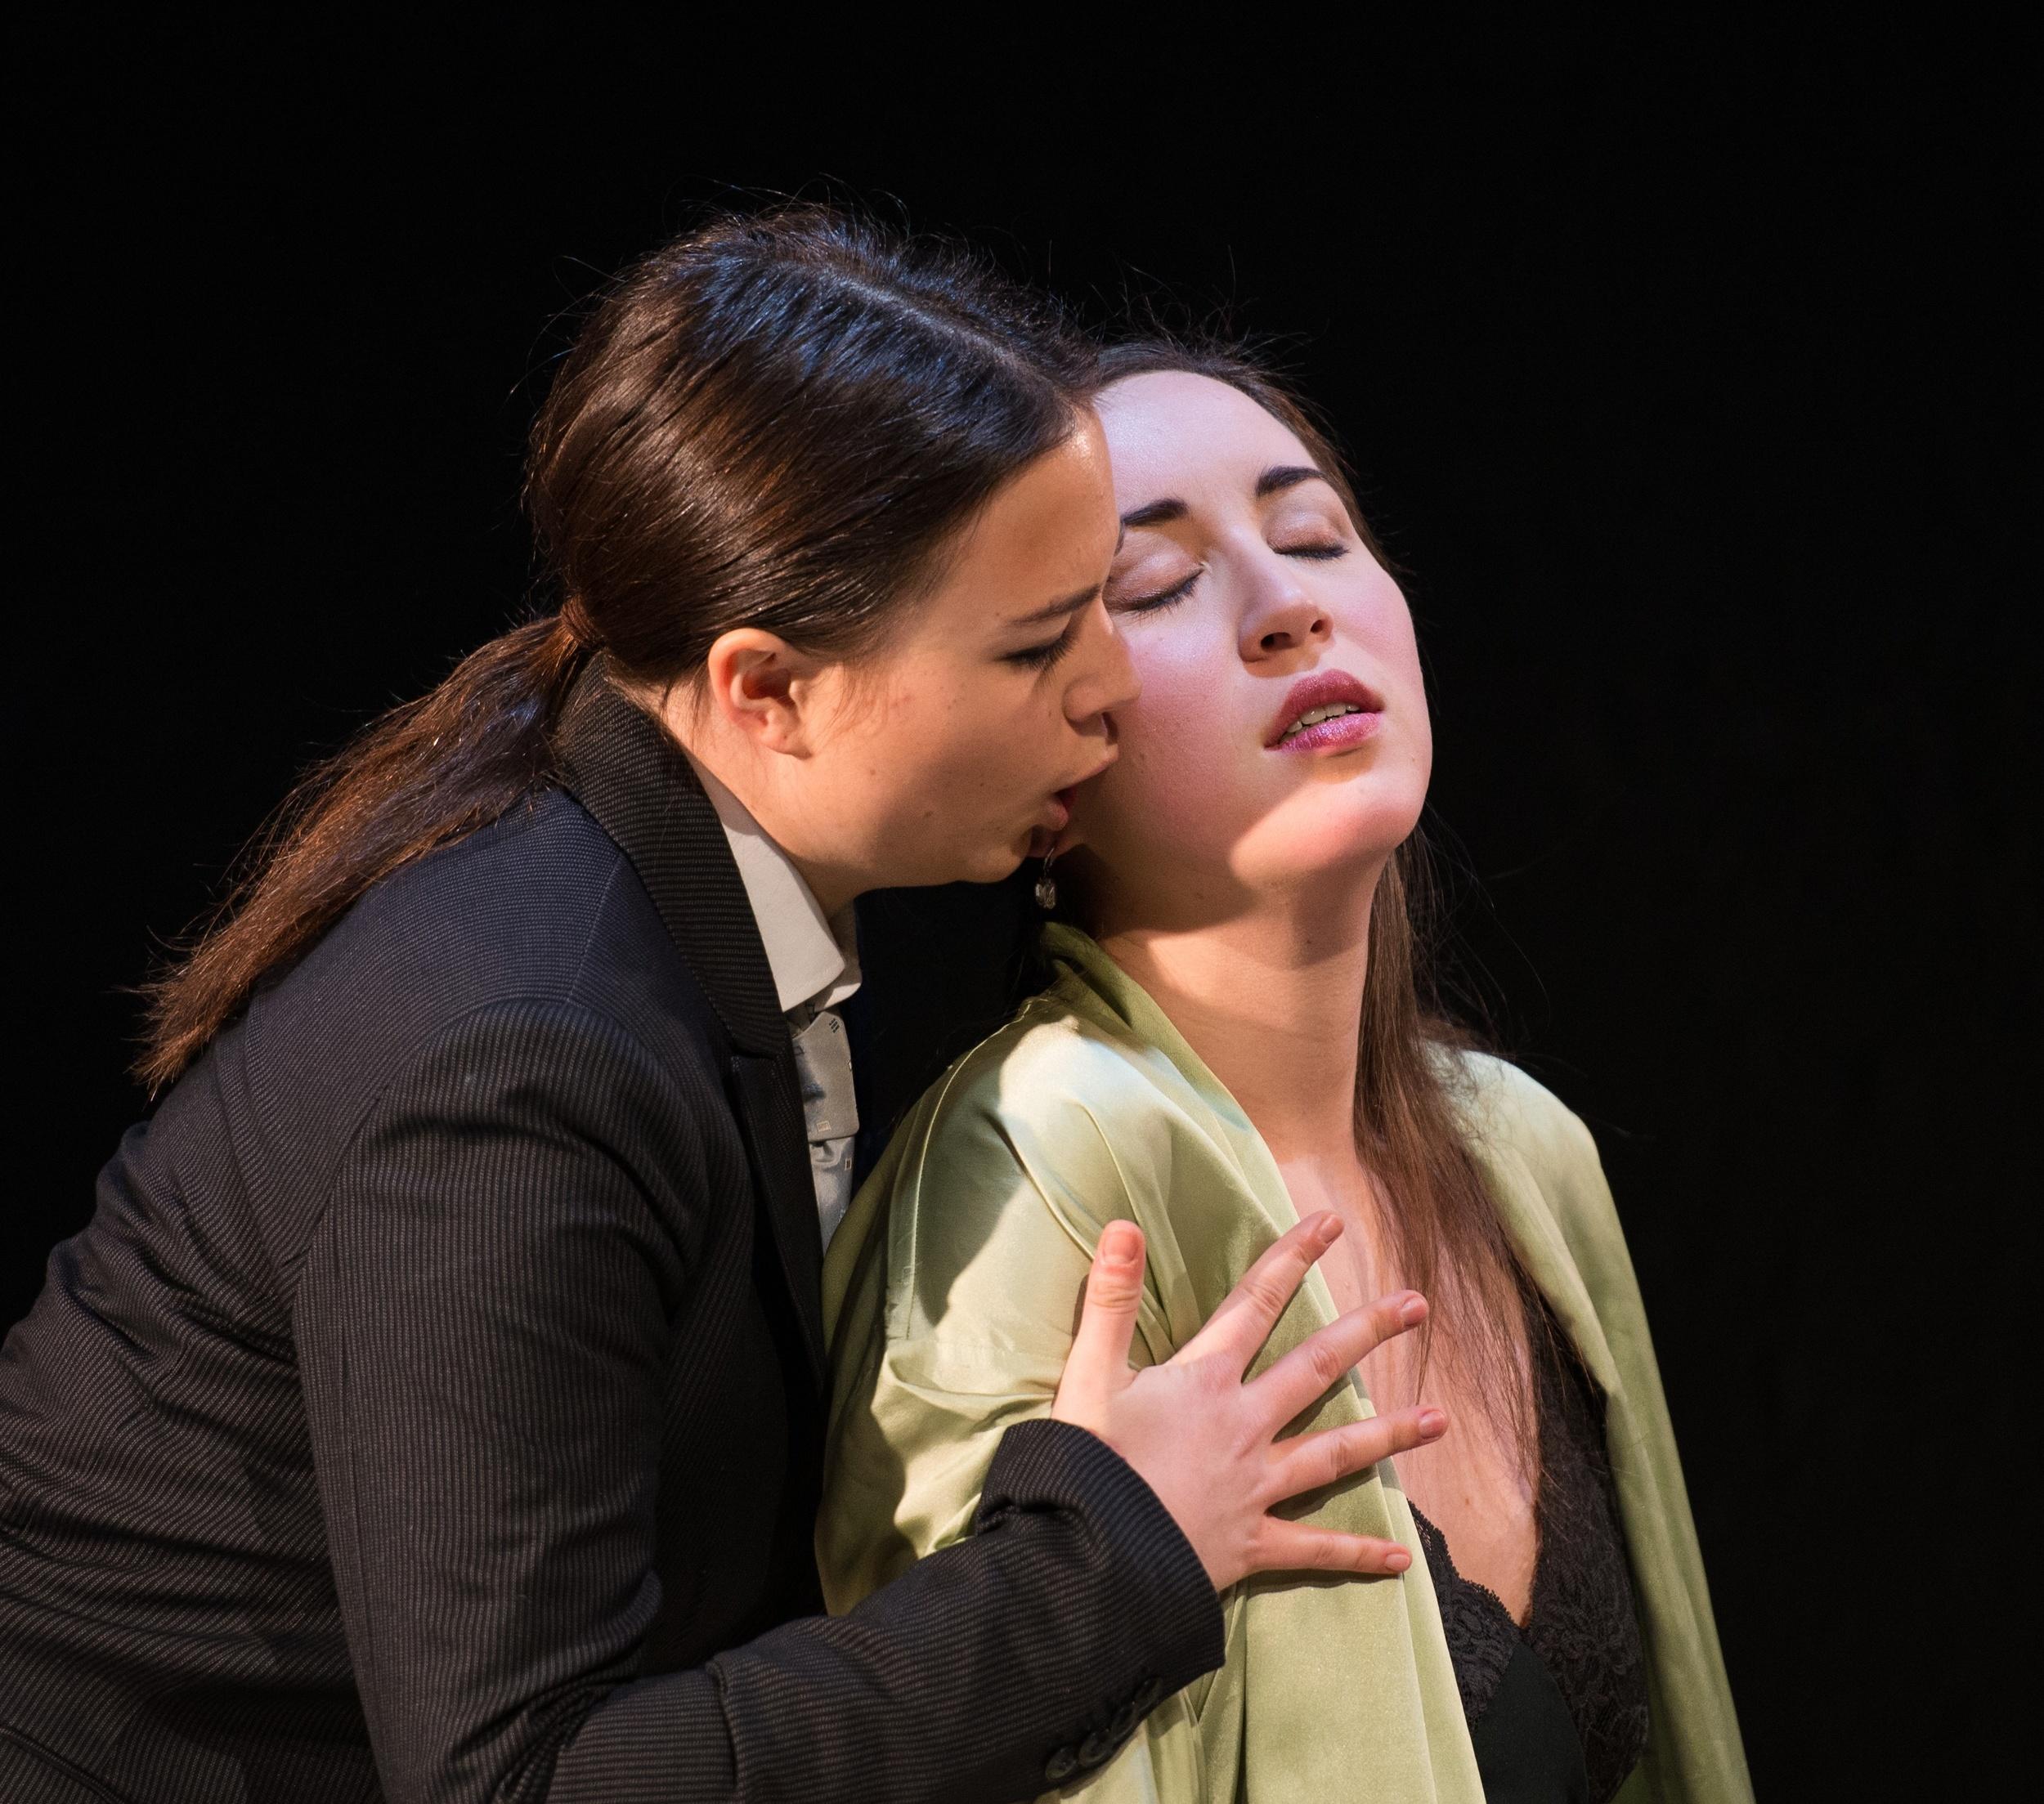 Szenenabend an der Theaterakademie August Everding. Foto © Jean-Marc Turmes